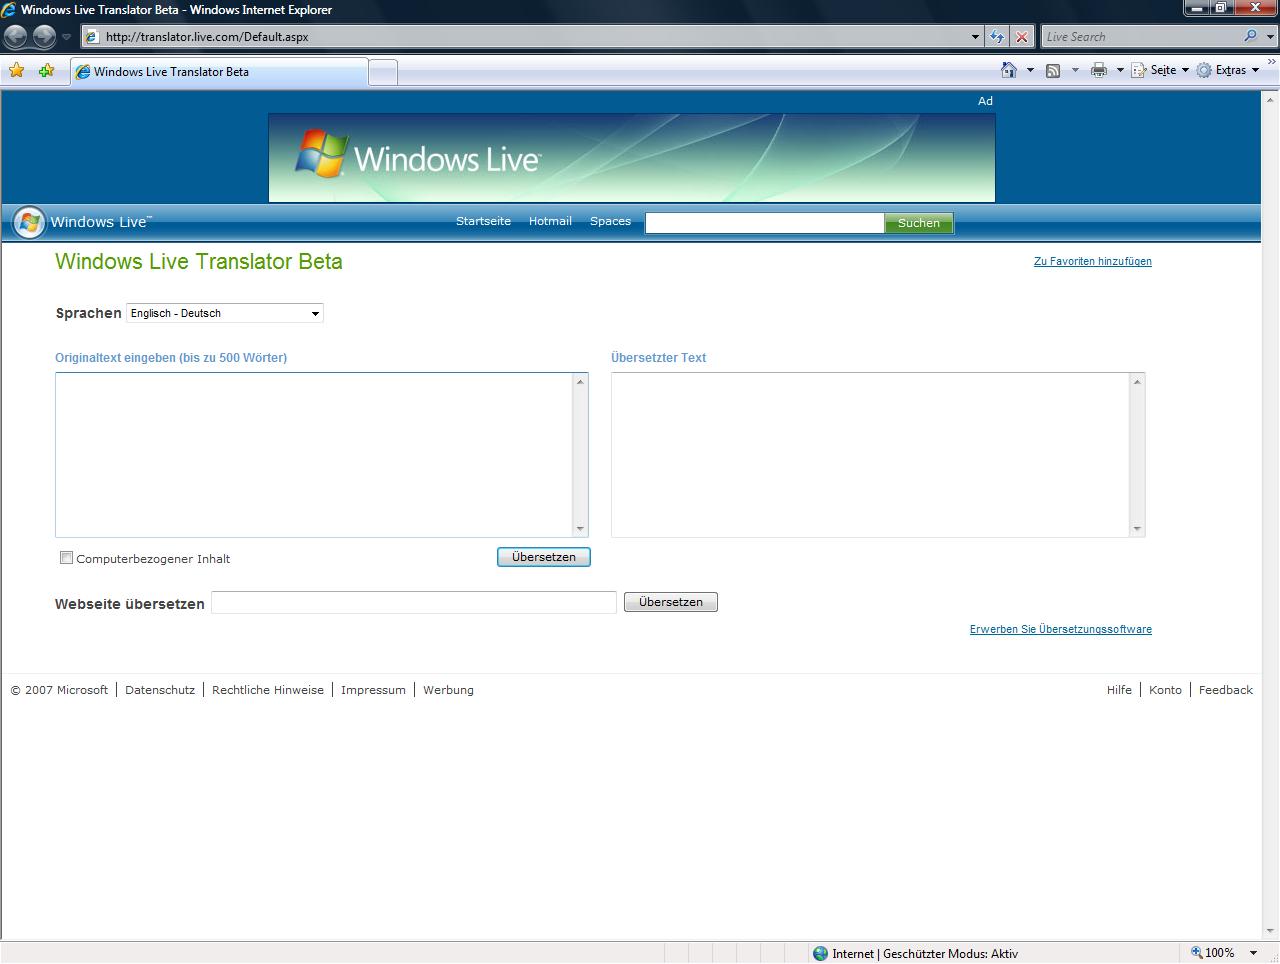 Windows Live Translator im Internet Explorer